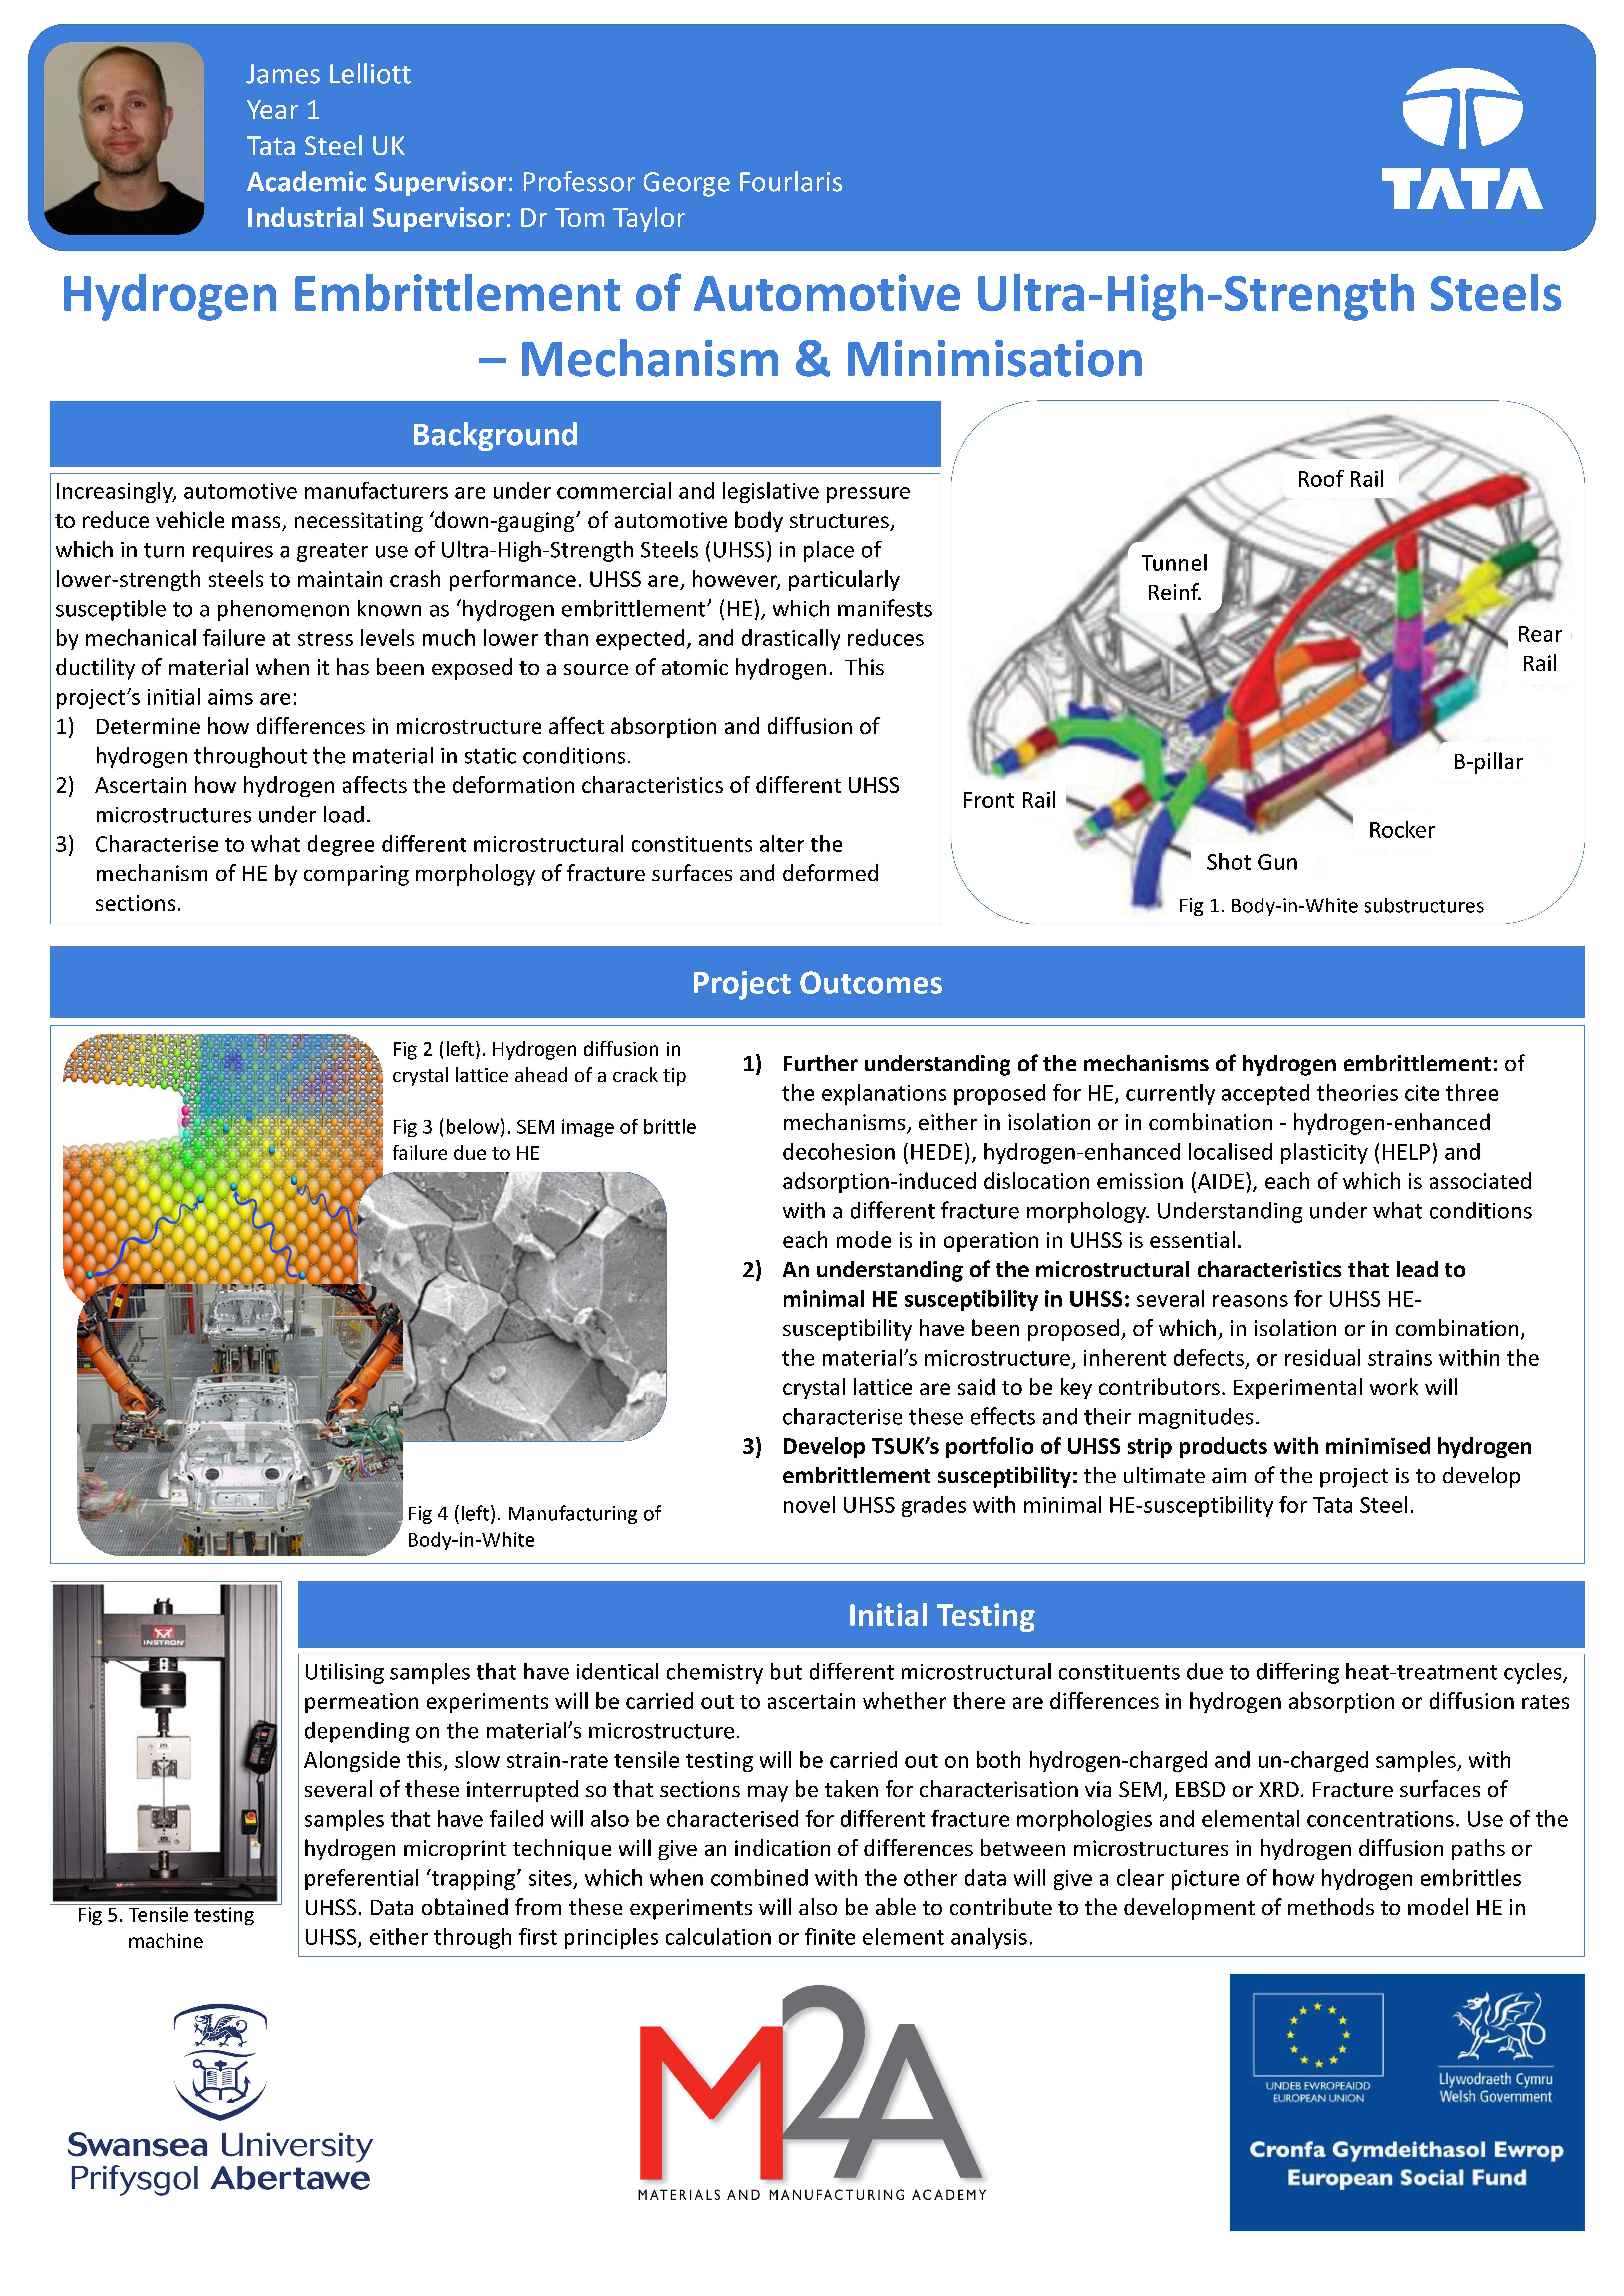 Hydrogen Embrittlement of Automotive Ultra-High-Strength Steels – Mechanism & Minimisation